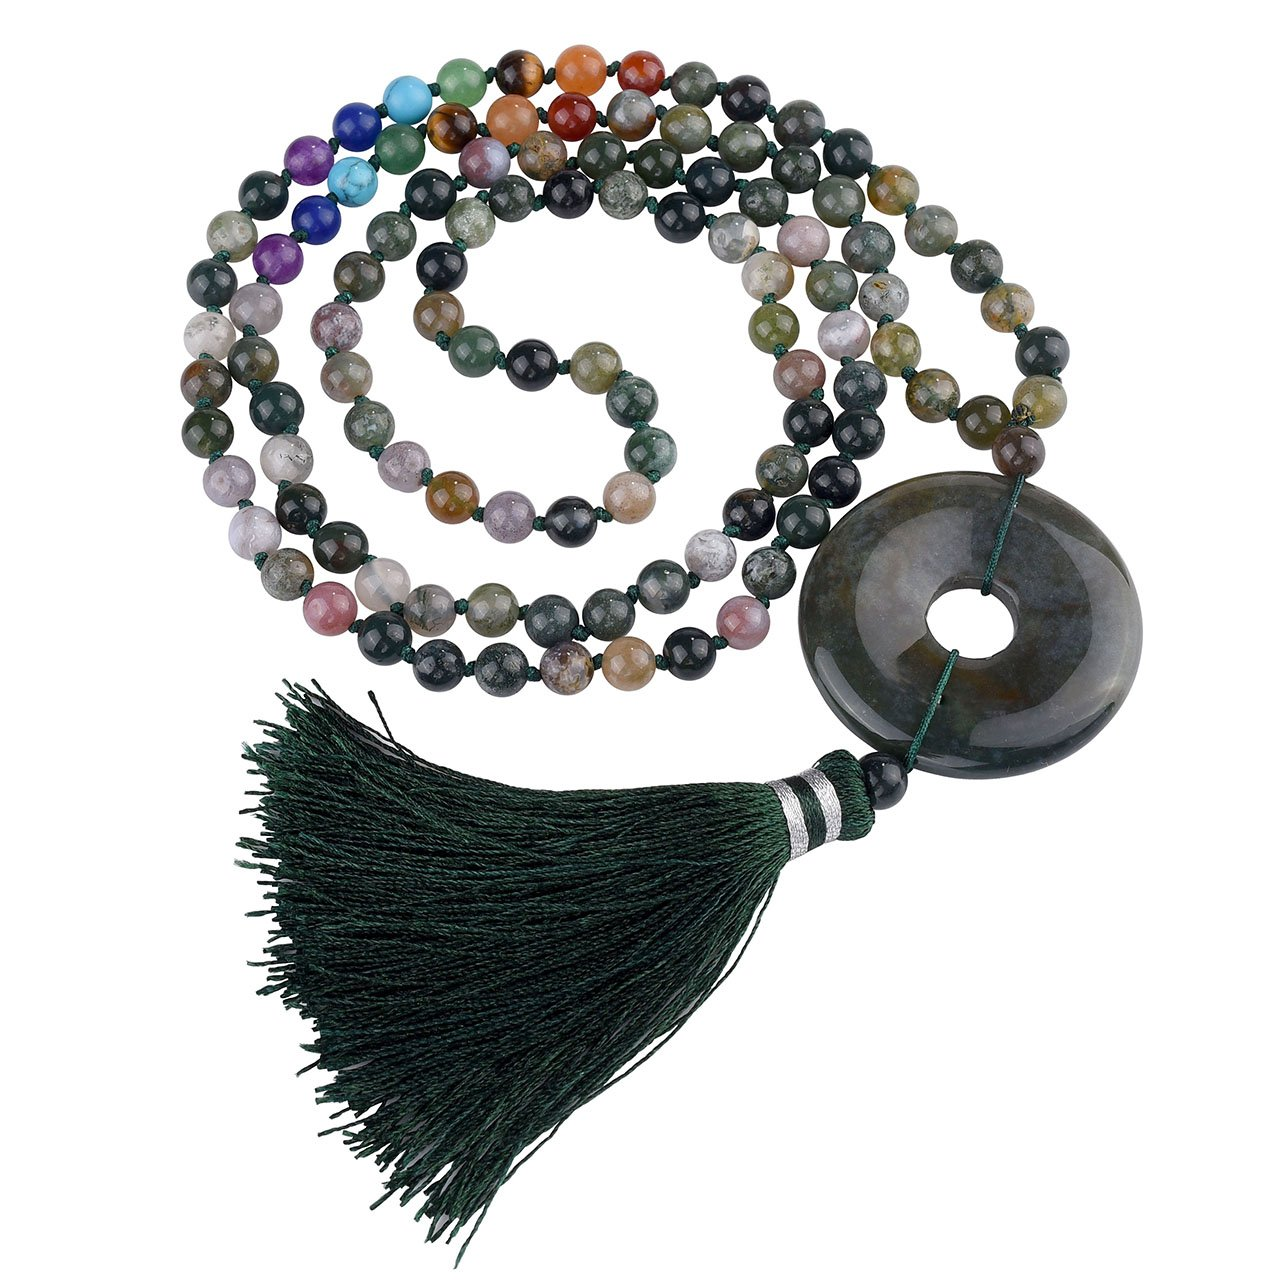 JOVIVI 6mm Moss Agate Gemstones 108 Buddhist Prayer Beads 7 Chakra Multilayer Mala Beads Donut Tassel Bracelet Necklace